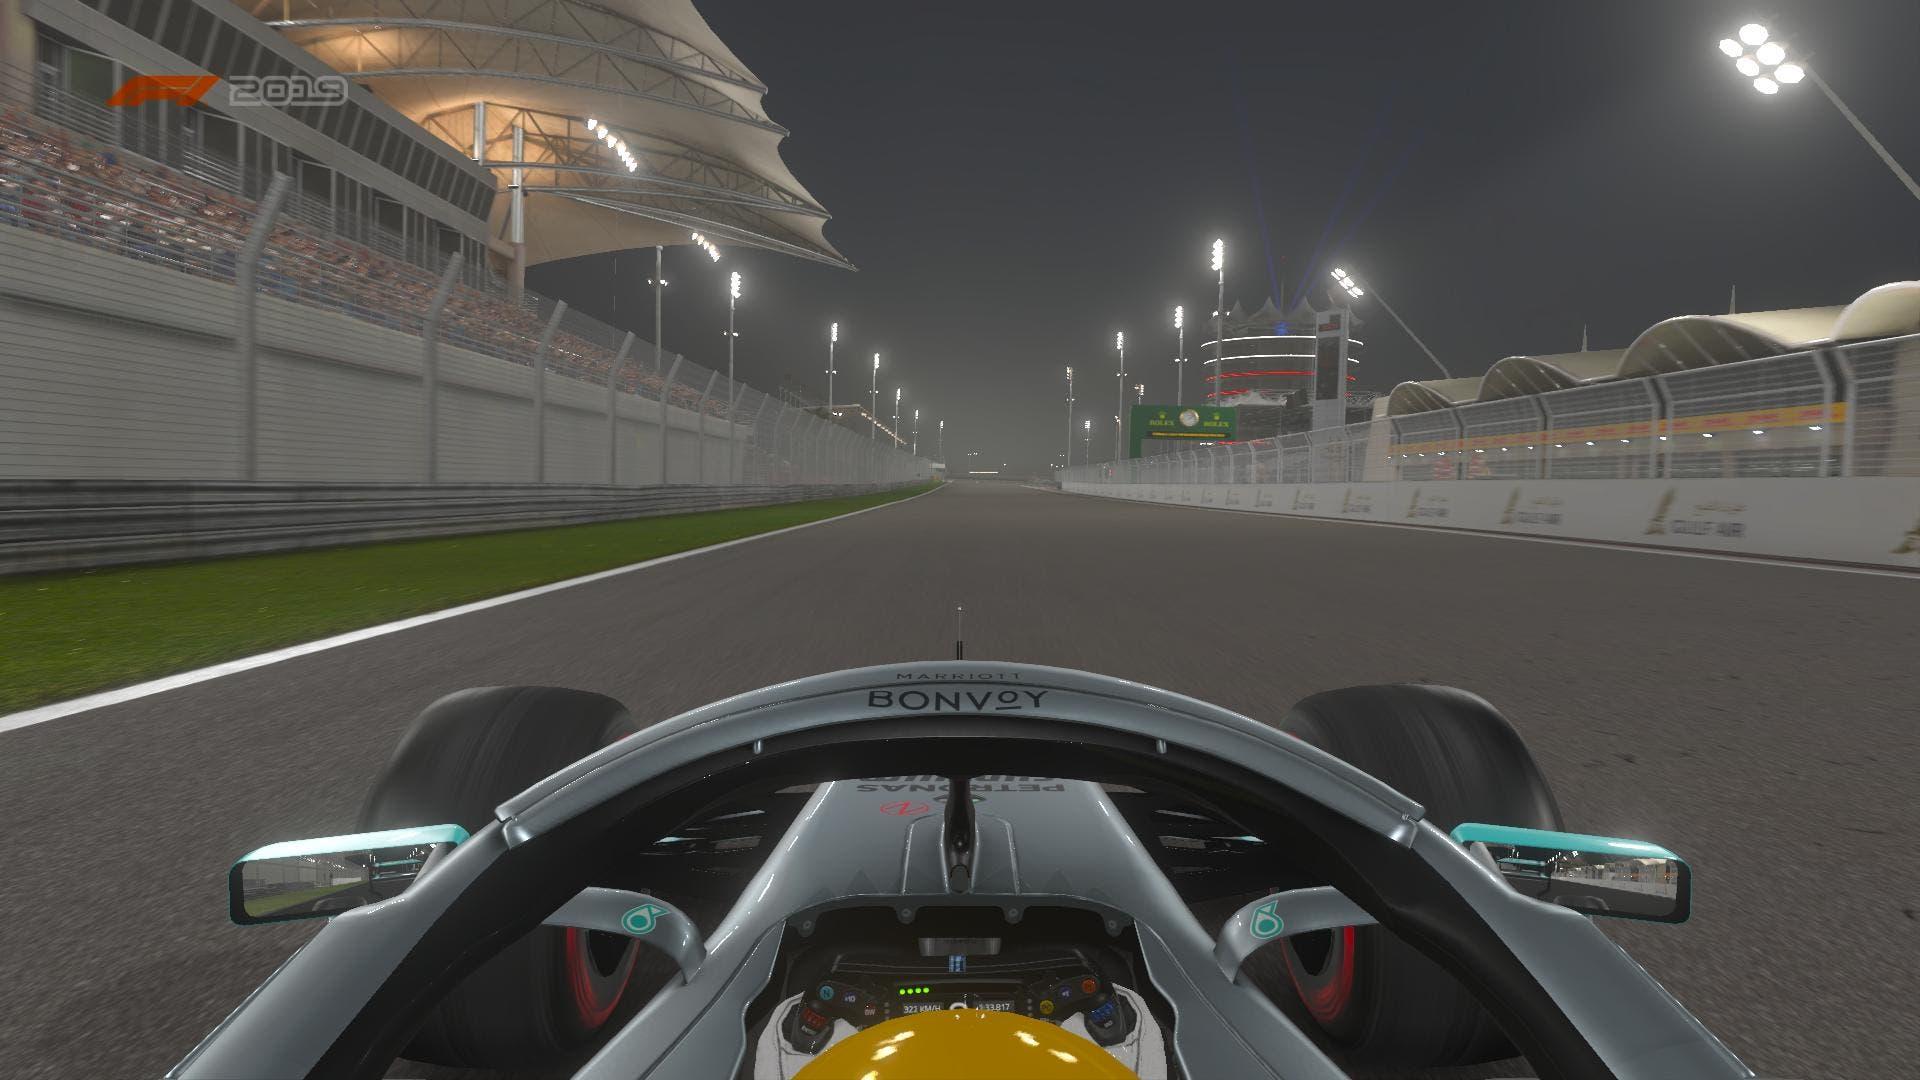 Análisis de F1 2019 - Xbox One 4